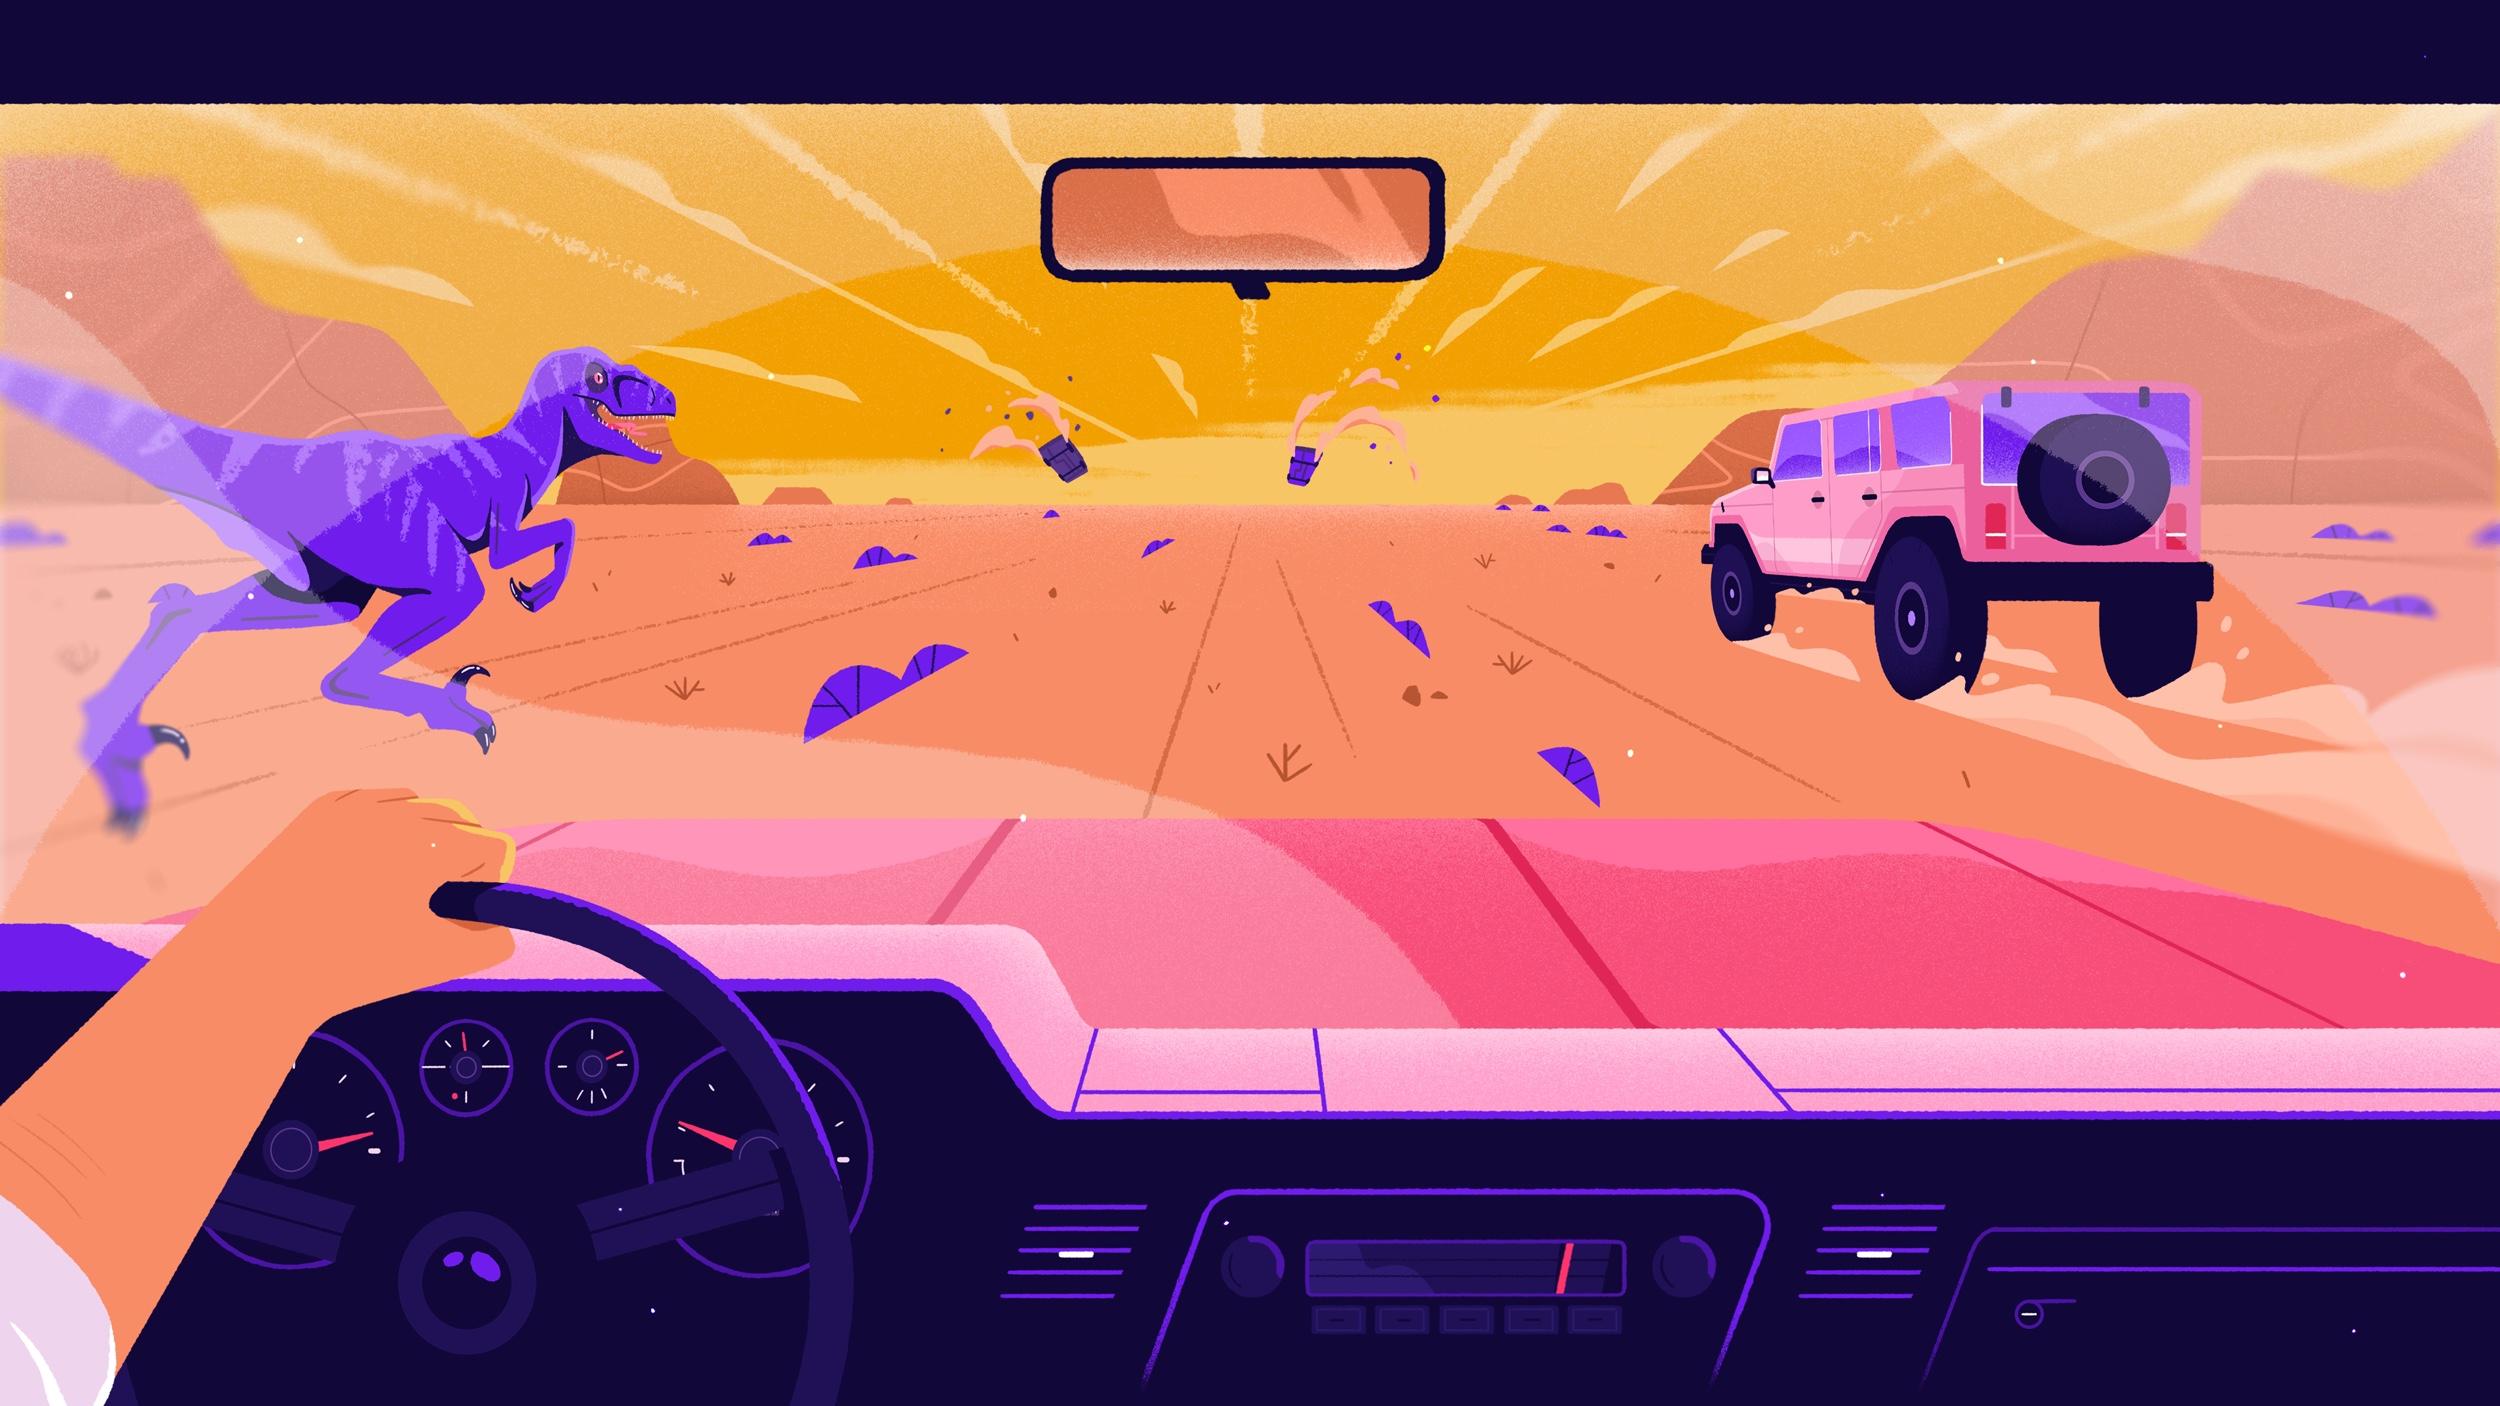 Super Stylish Illustration and Animation: Wonderlust Ident /Racing